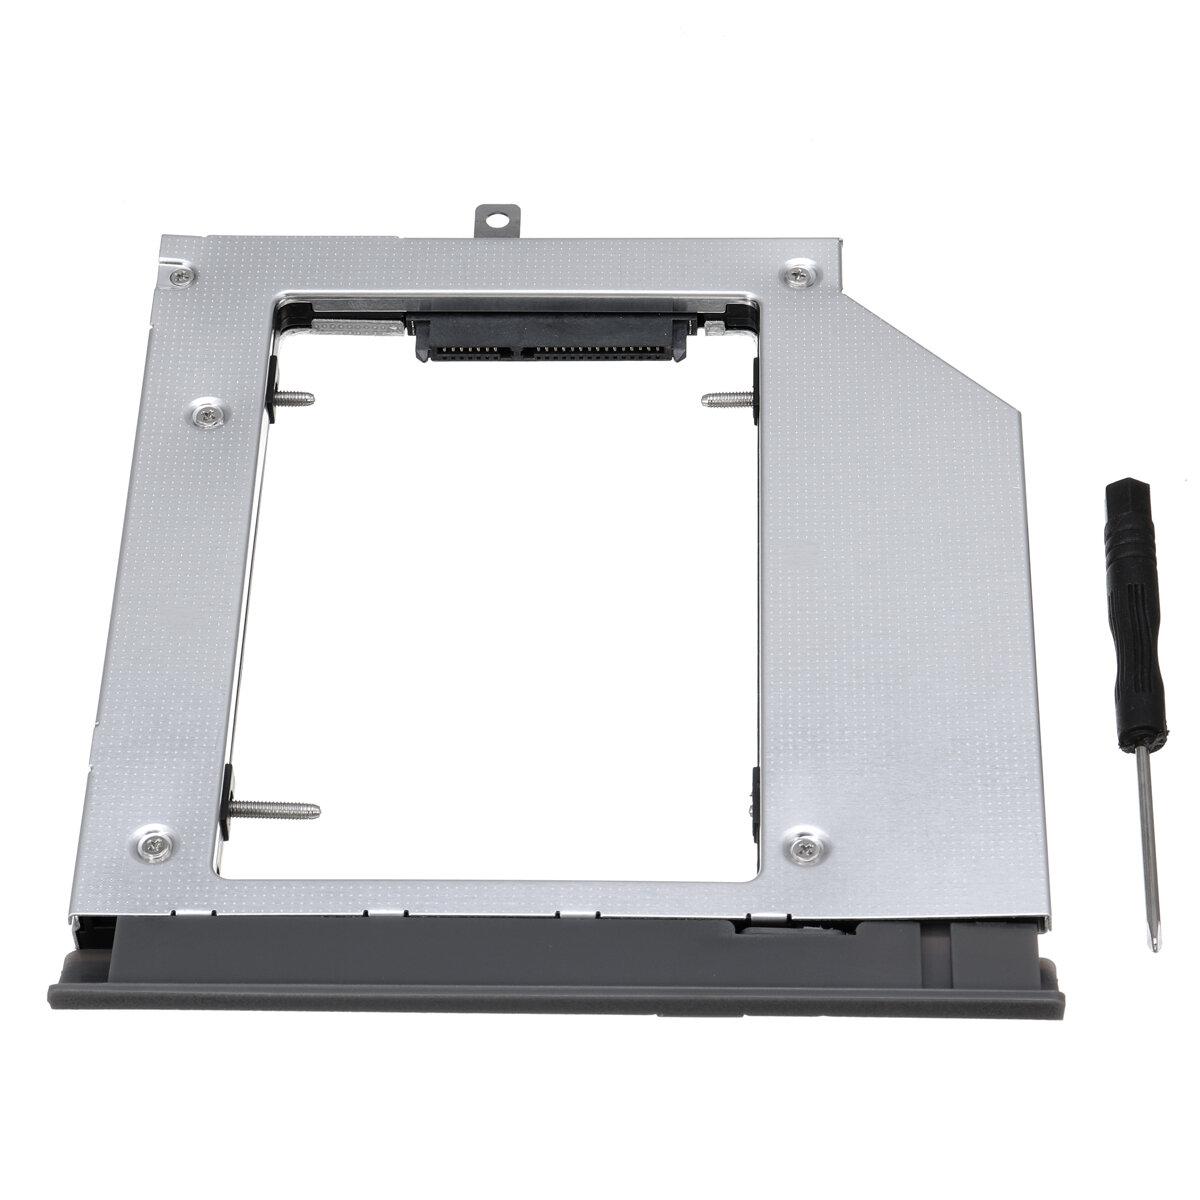 Ноутбук Optical Drive Bay Hard Drive Caddy Для Lenovo ideapad 320 330 520 Converter